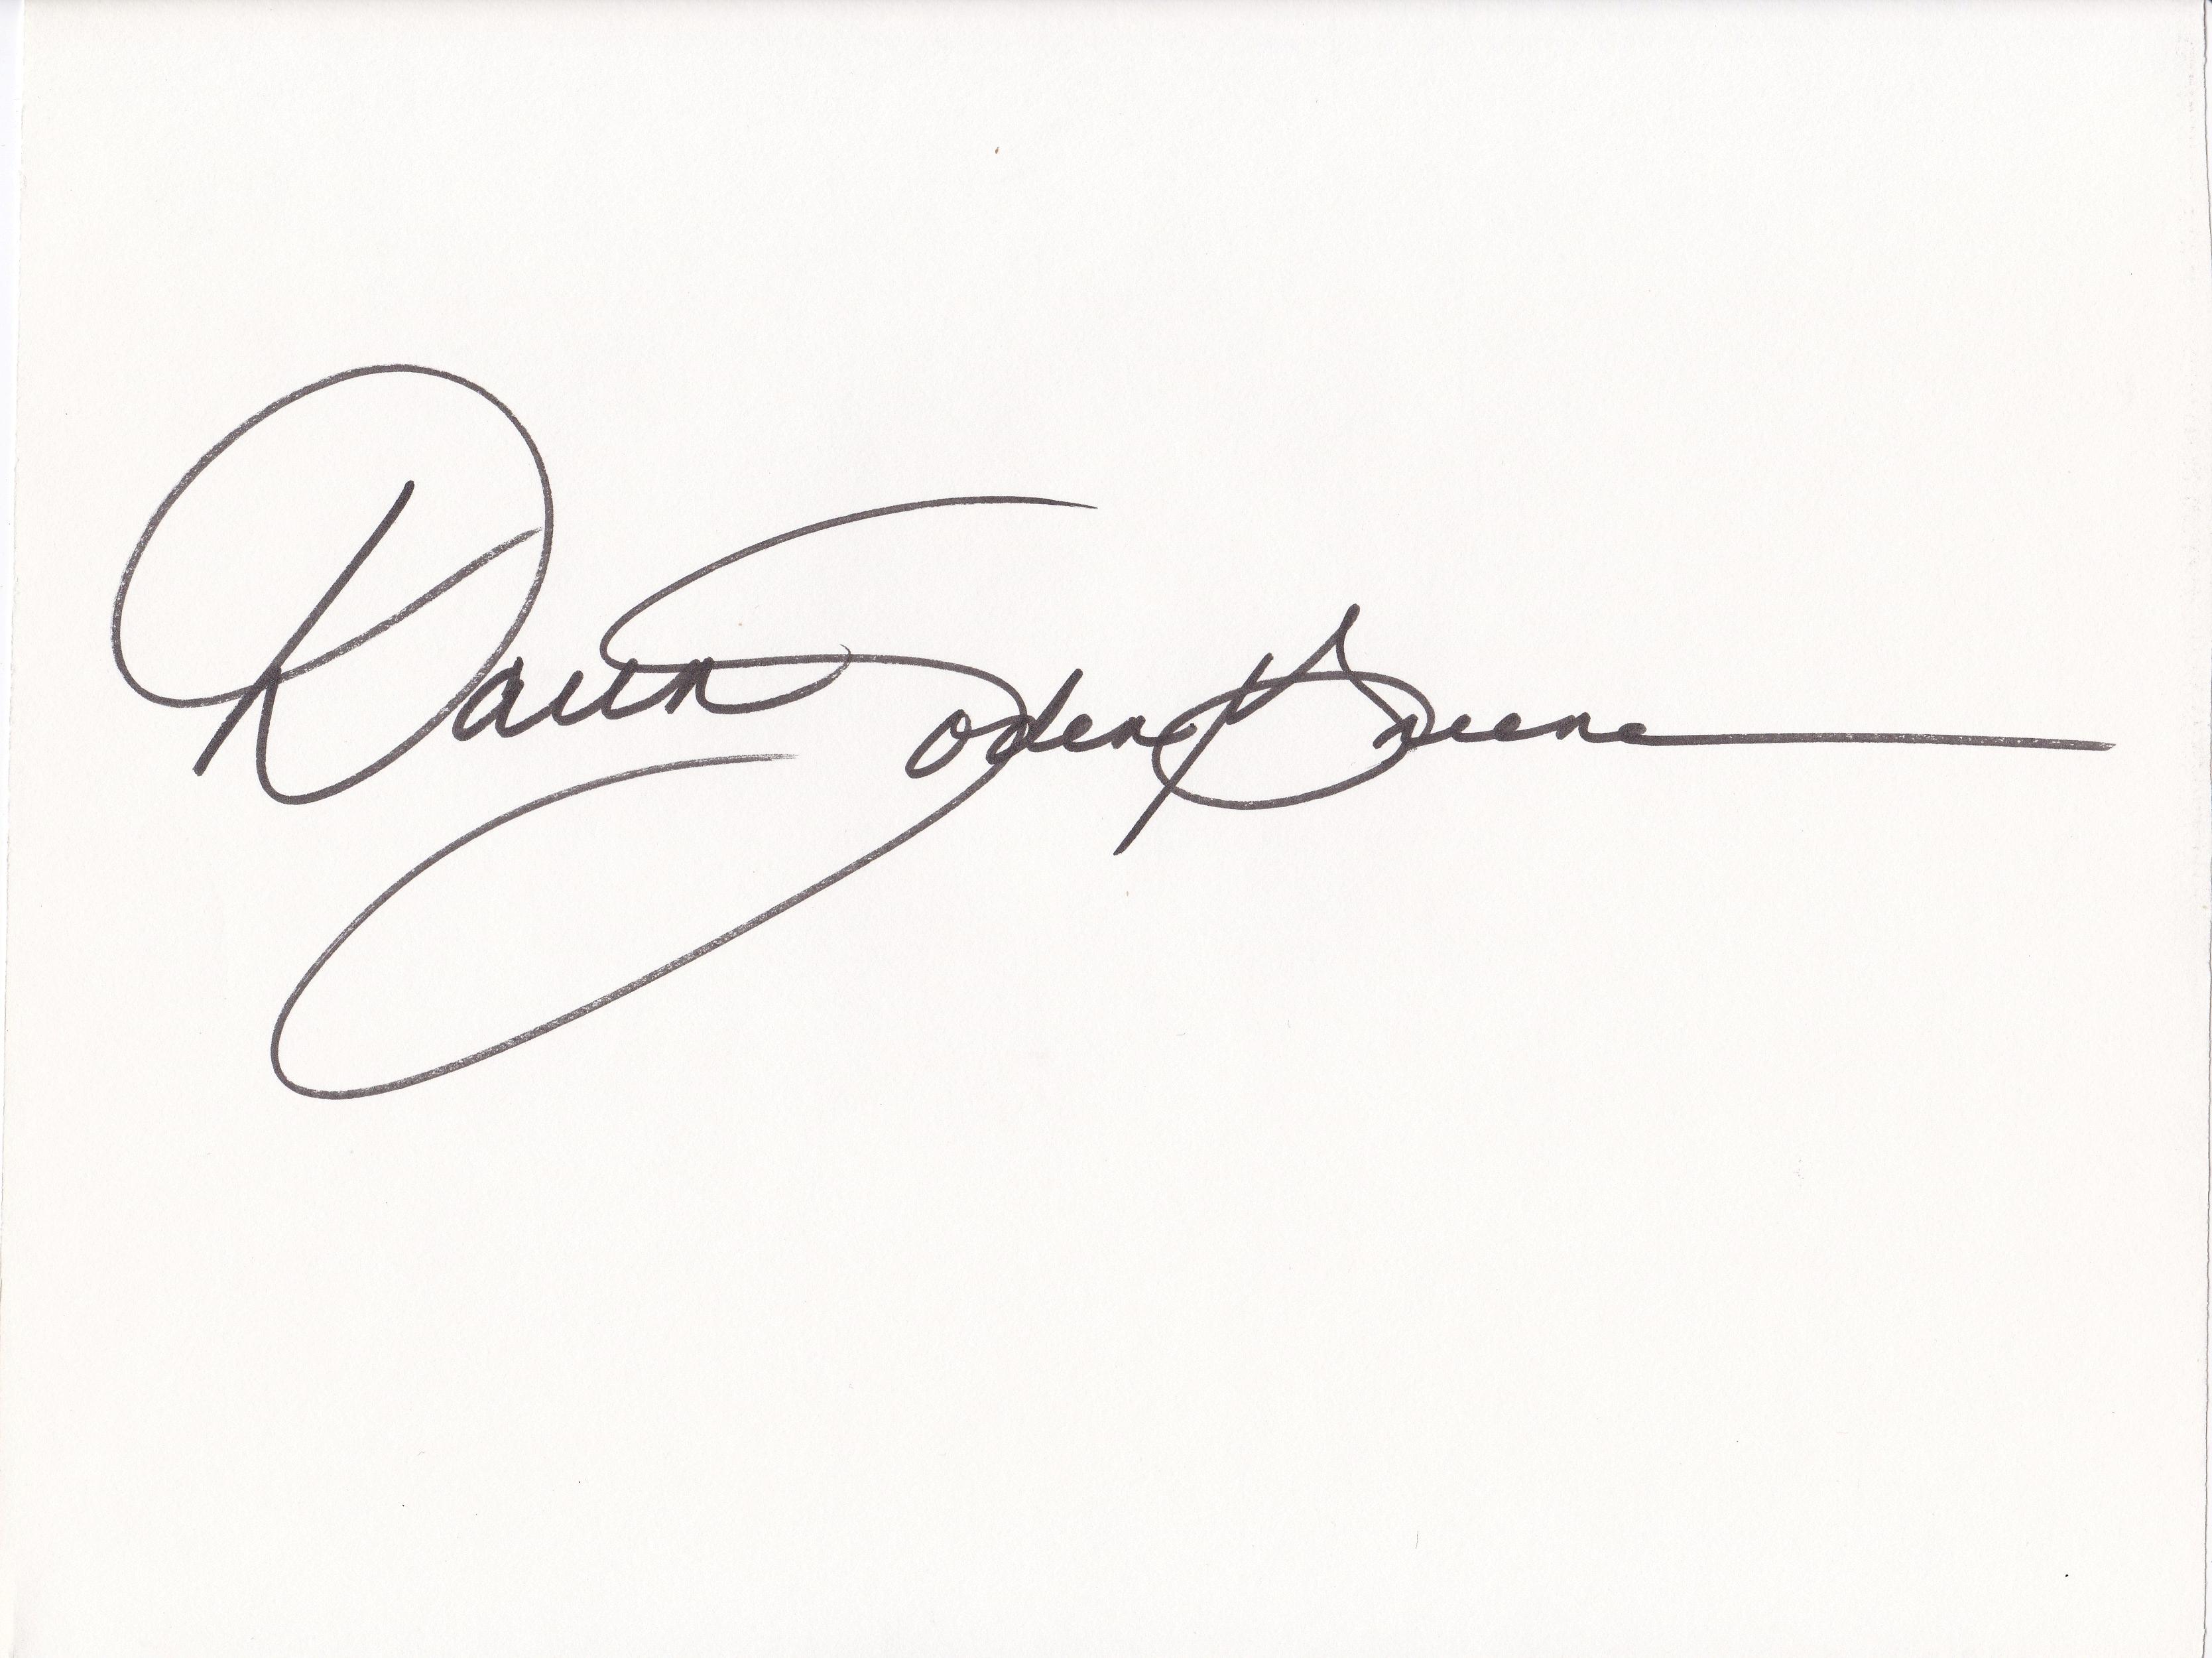 Daun Soden-Greene's Signature